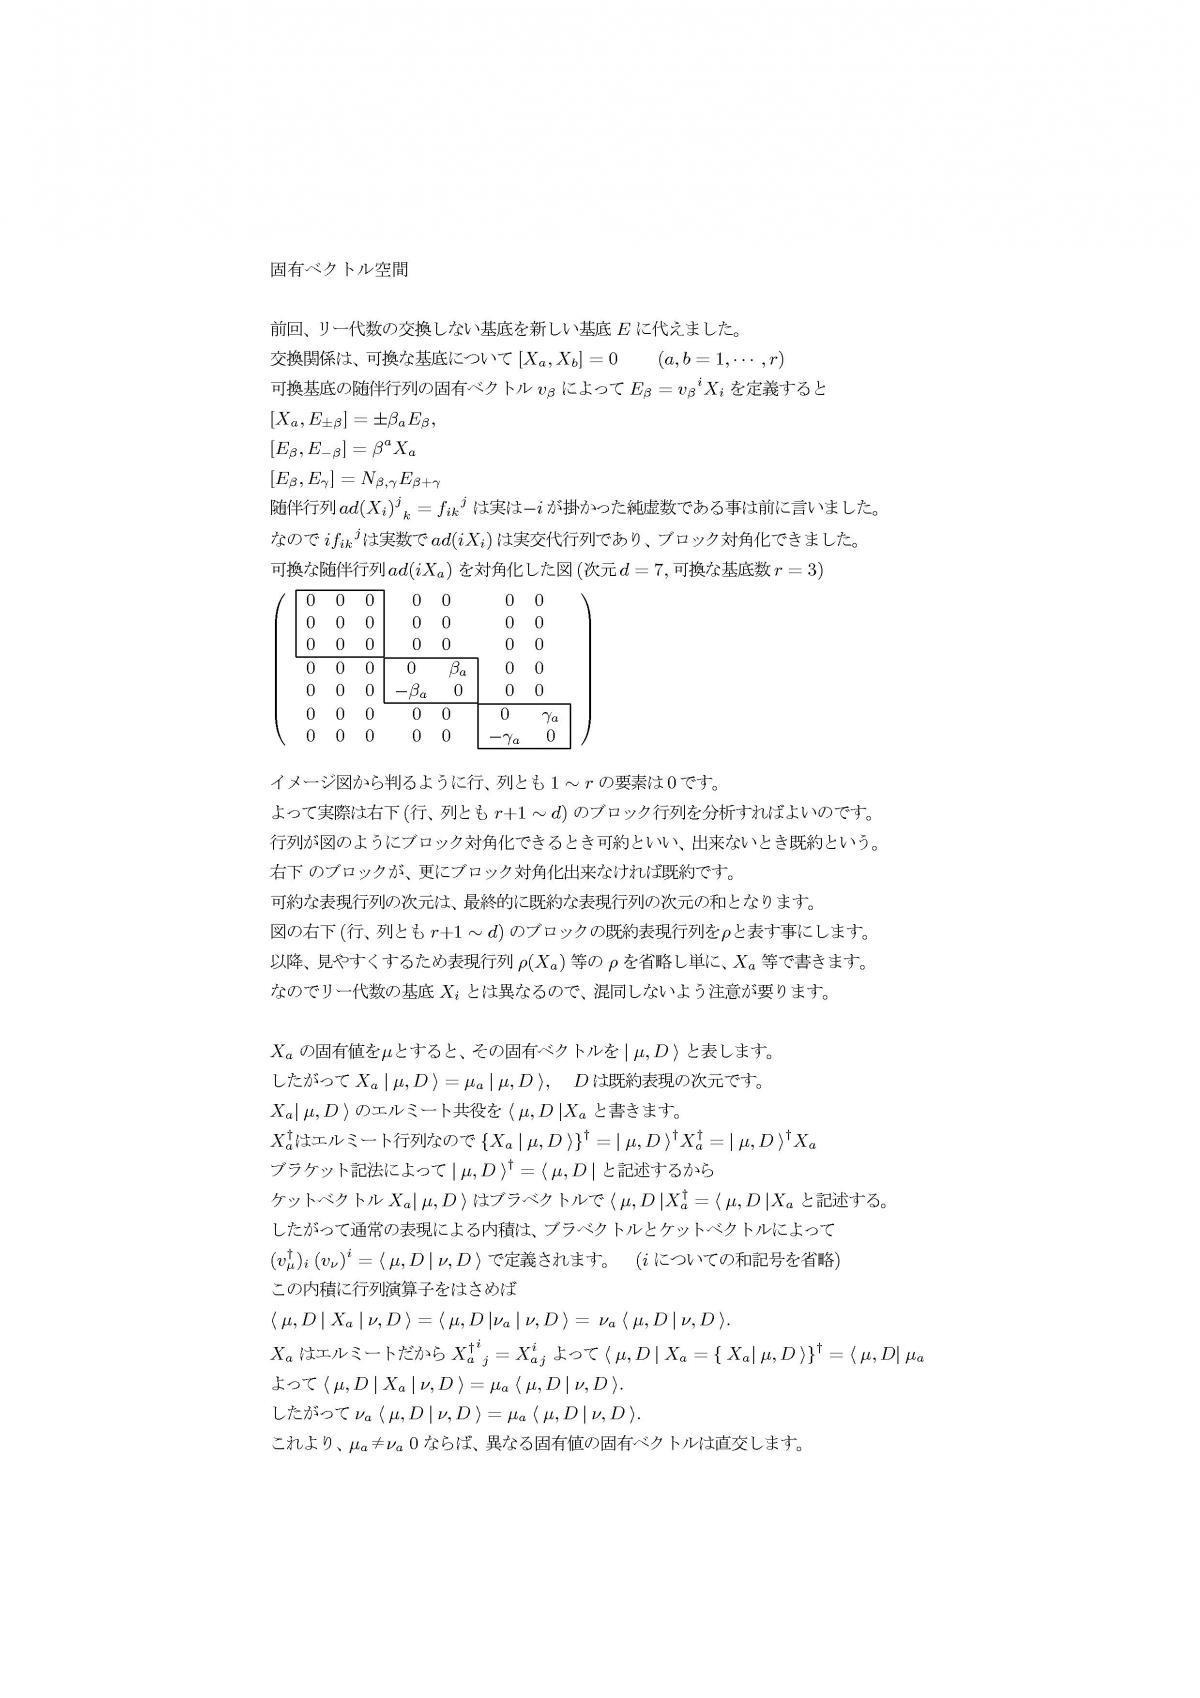 grp130806a.jpg